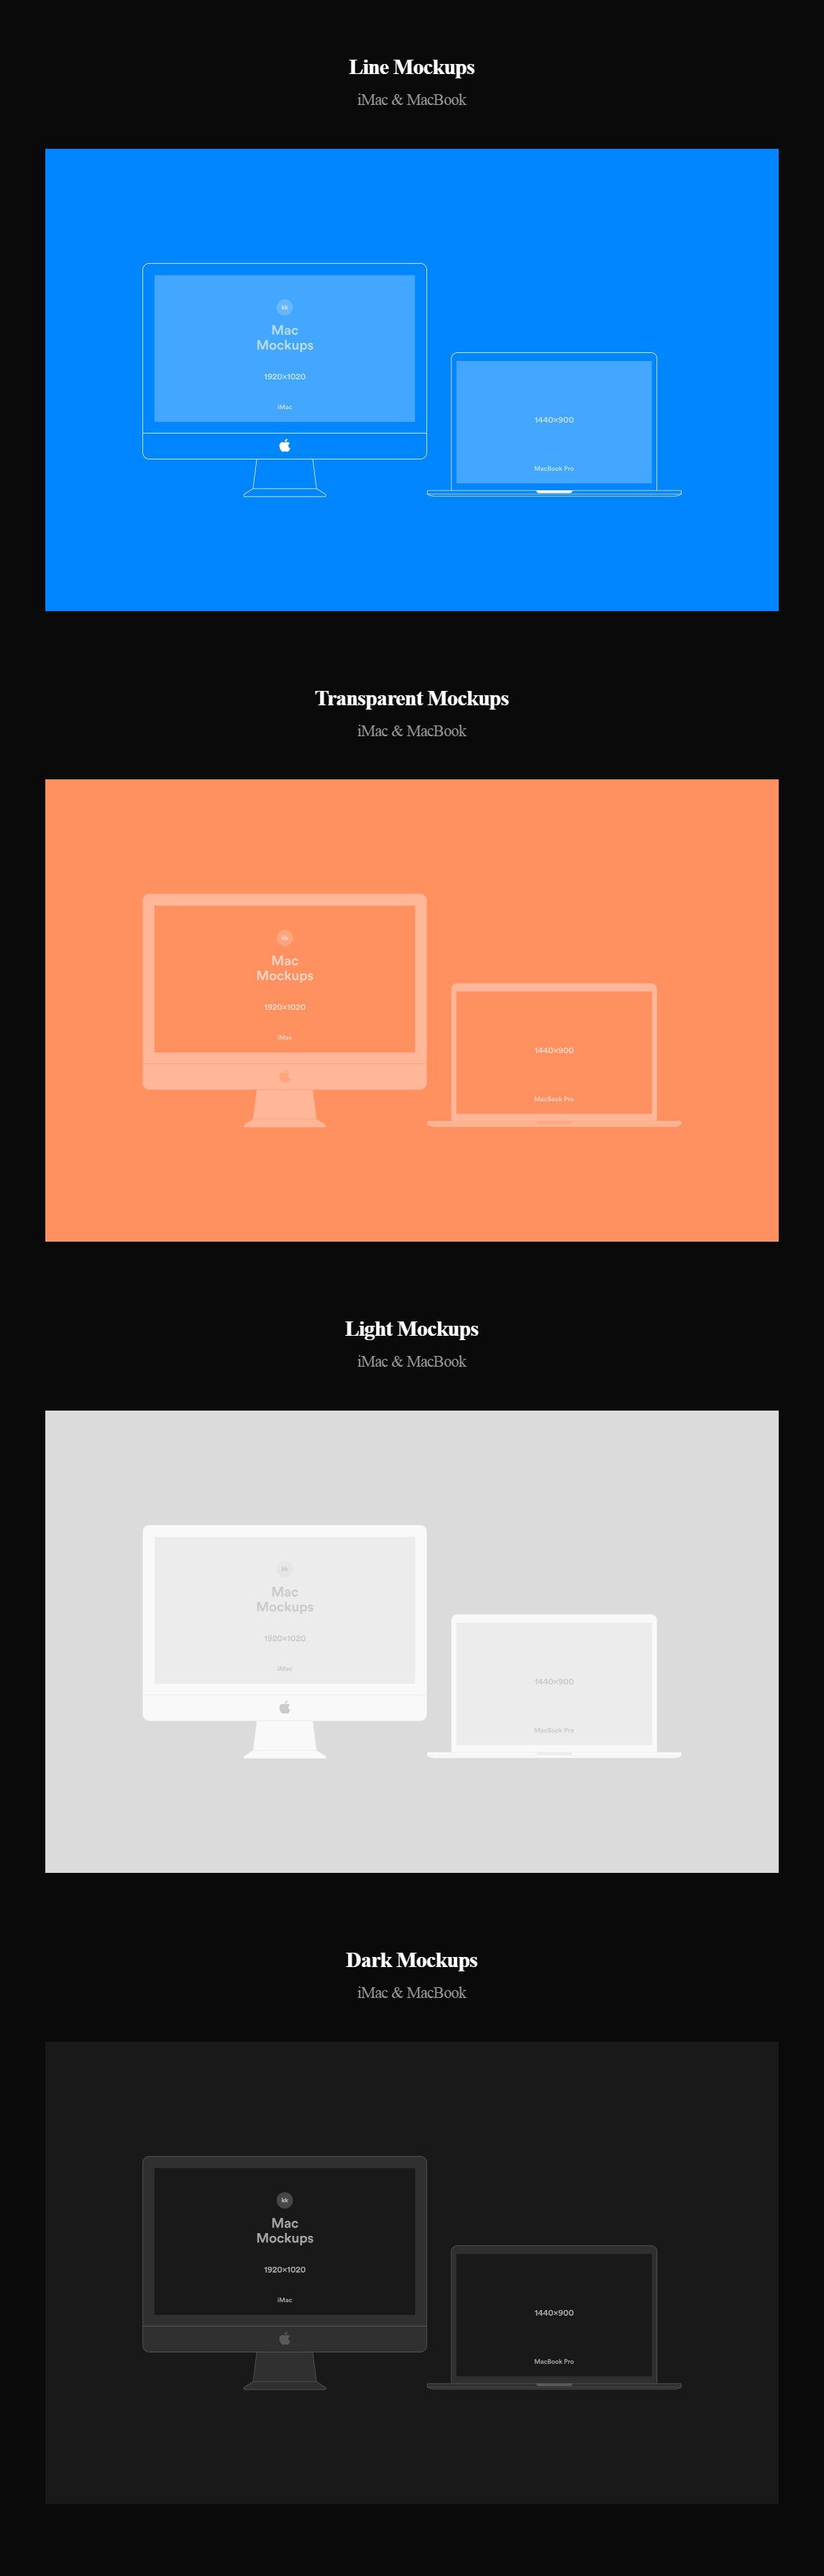 Free iMac and MacBook Vector Mockups